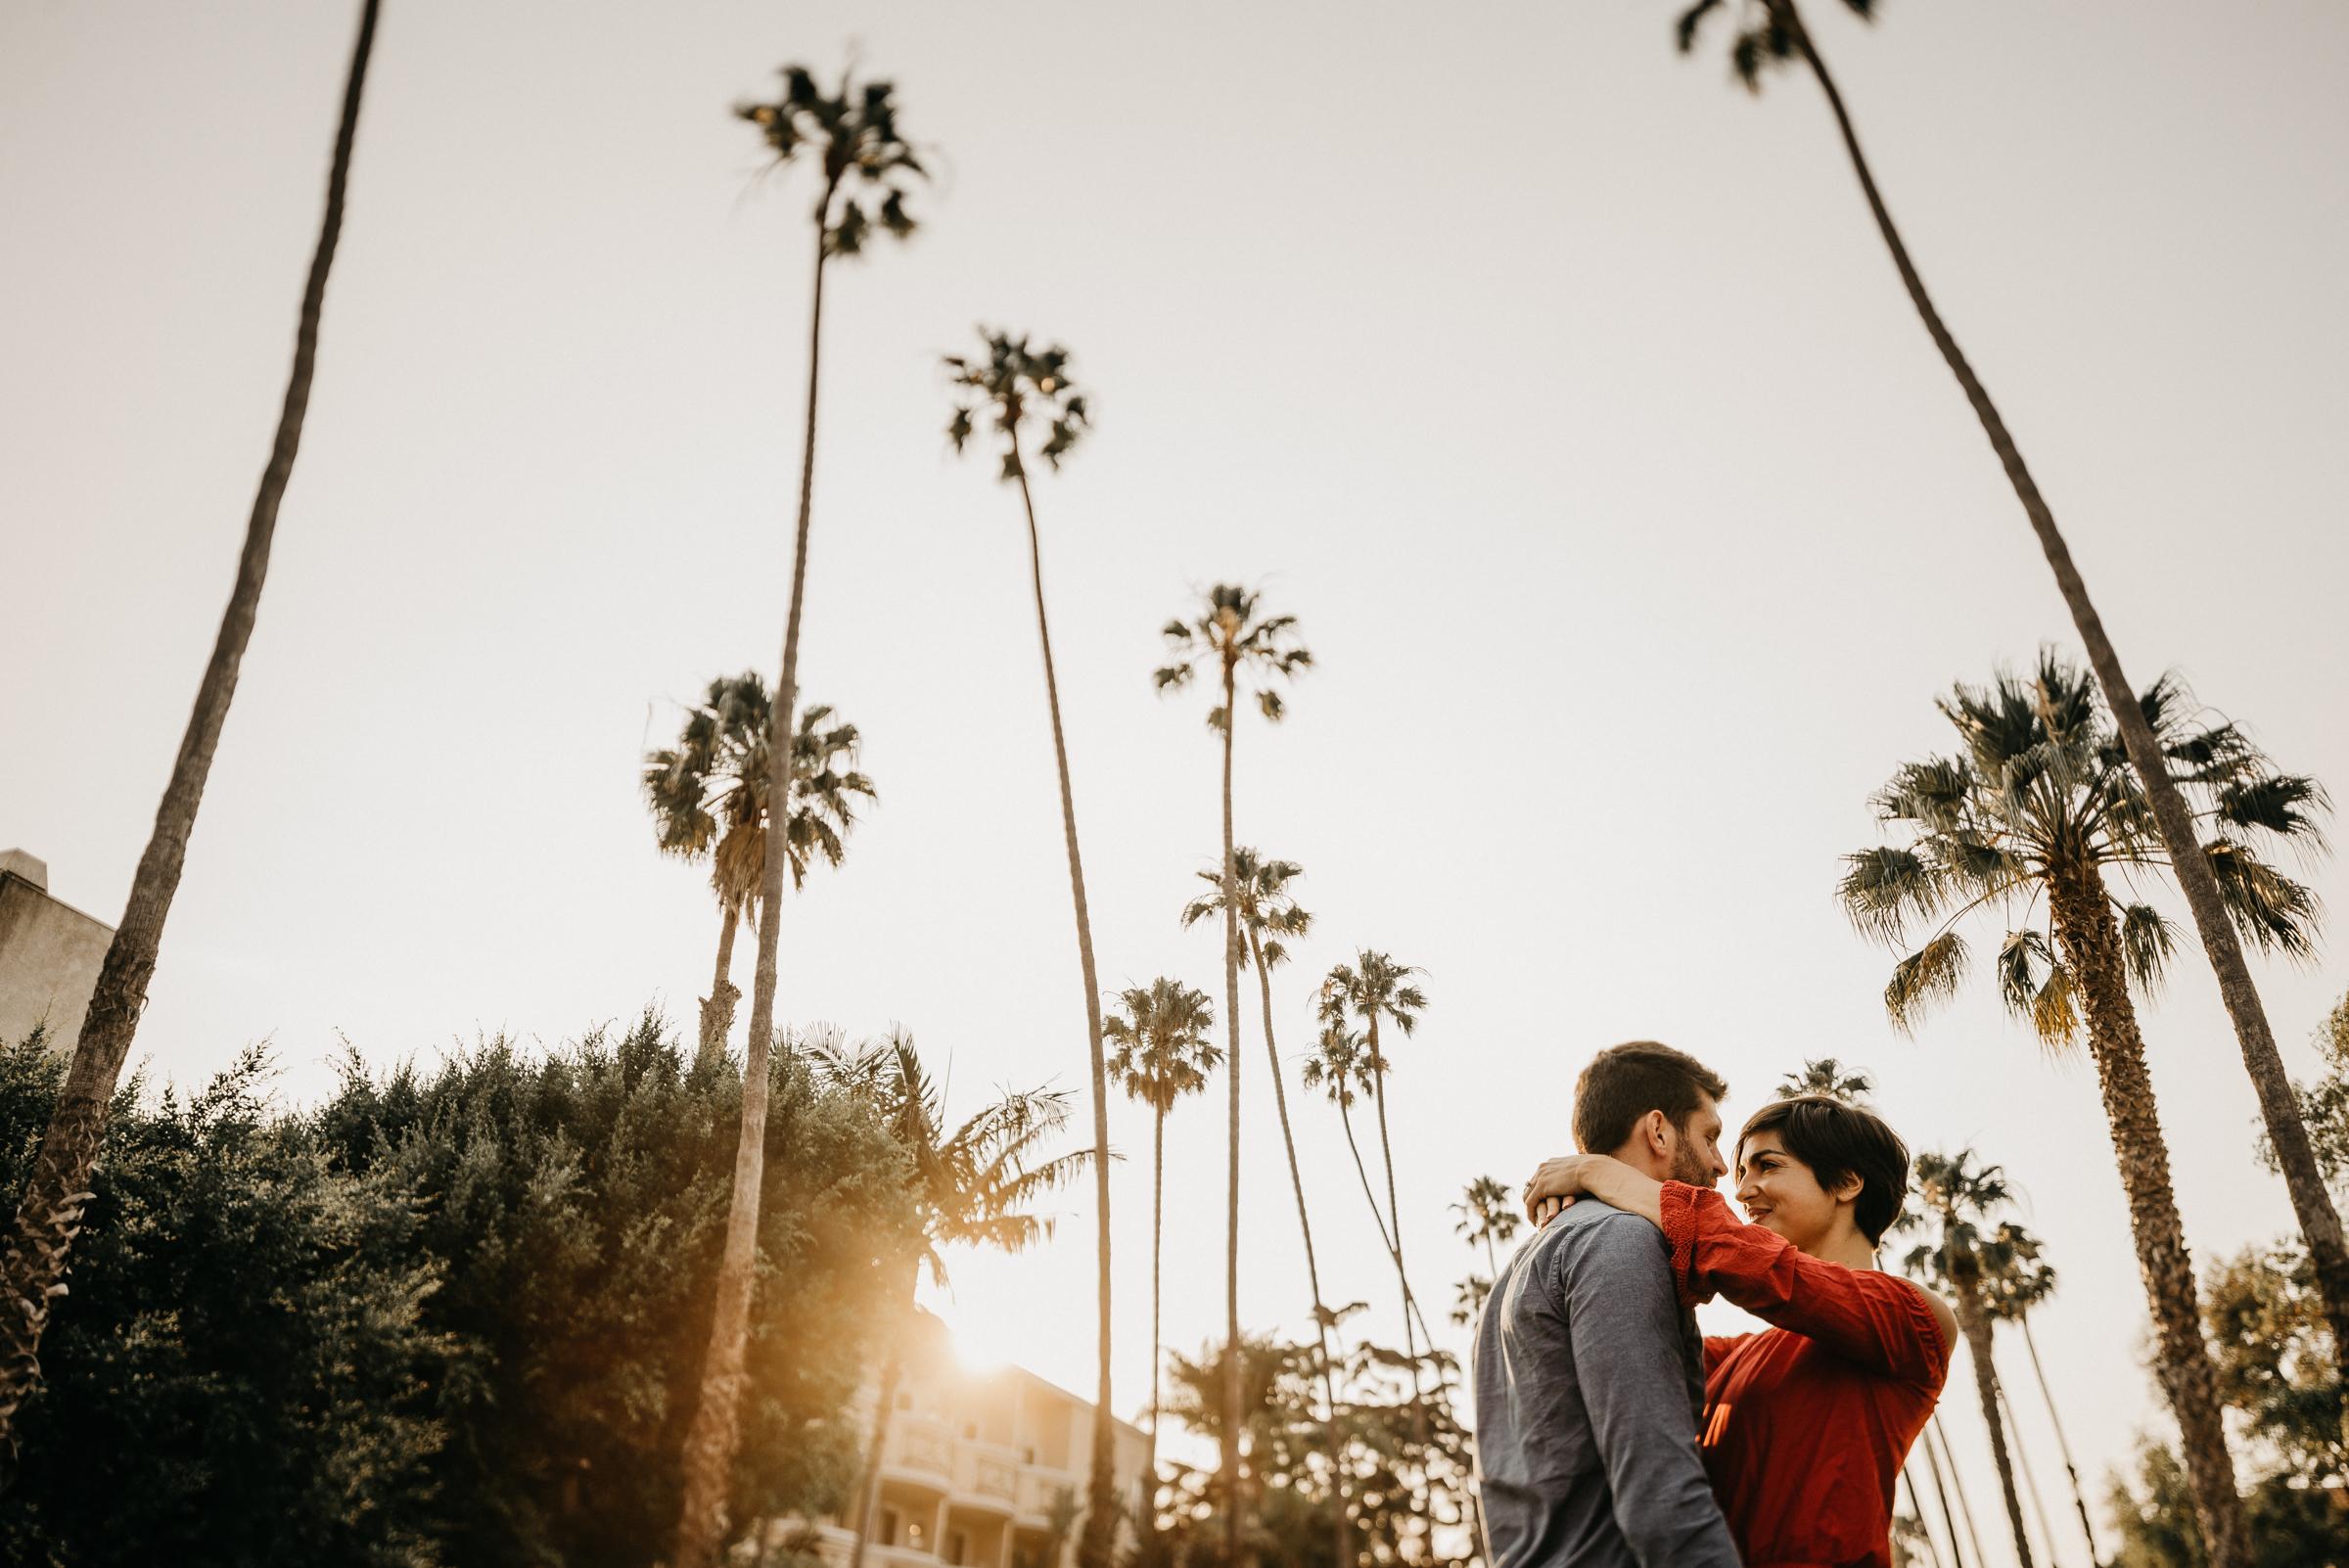 Isaiah + Taylor Photography - Santa Monica Engagement Session, Los Angeles Wedding Photographer-019.jpg